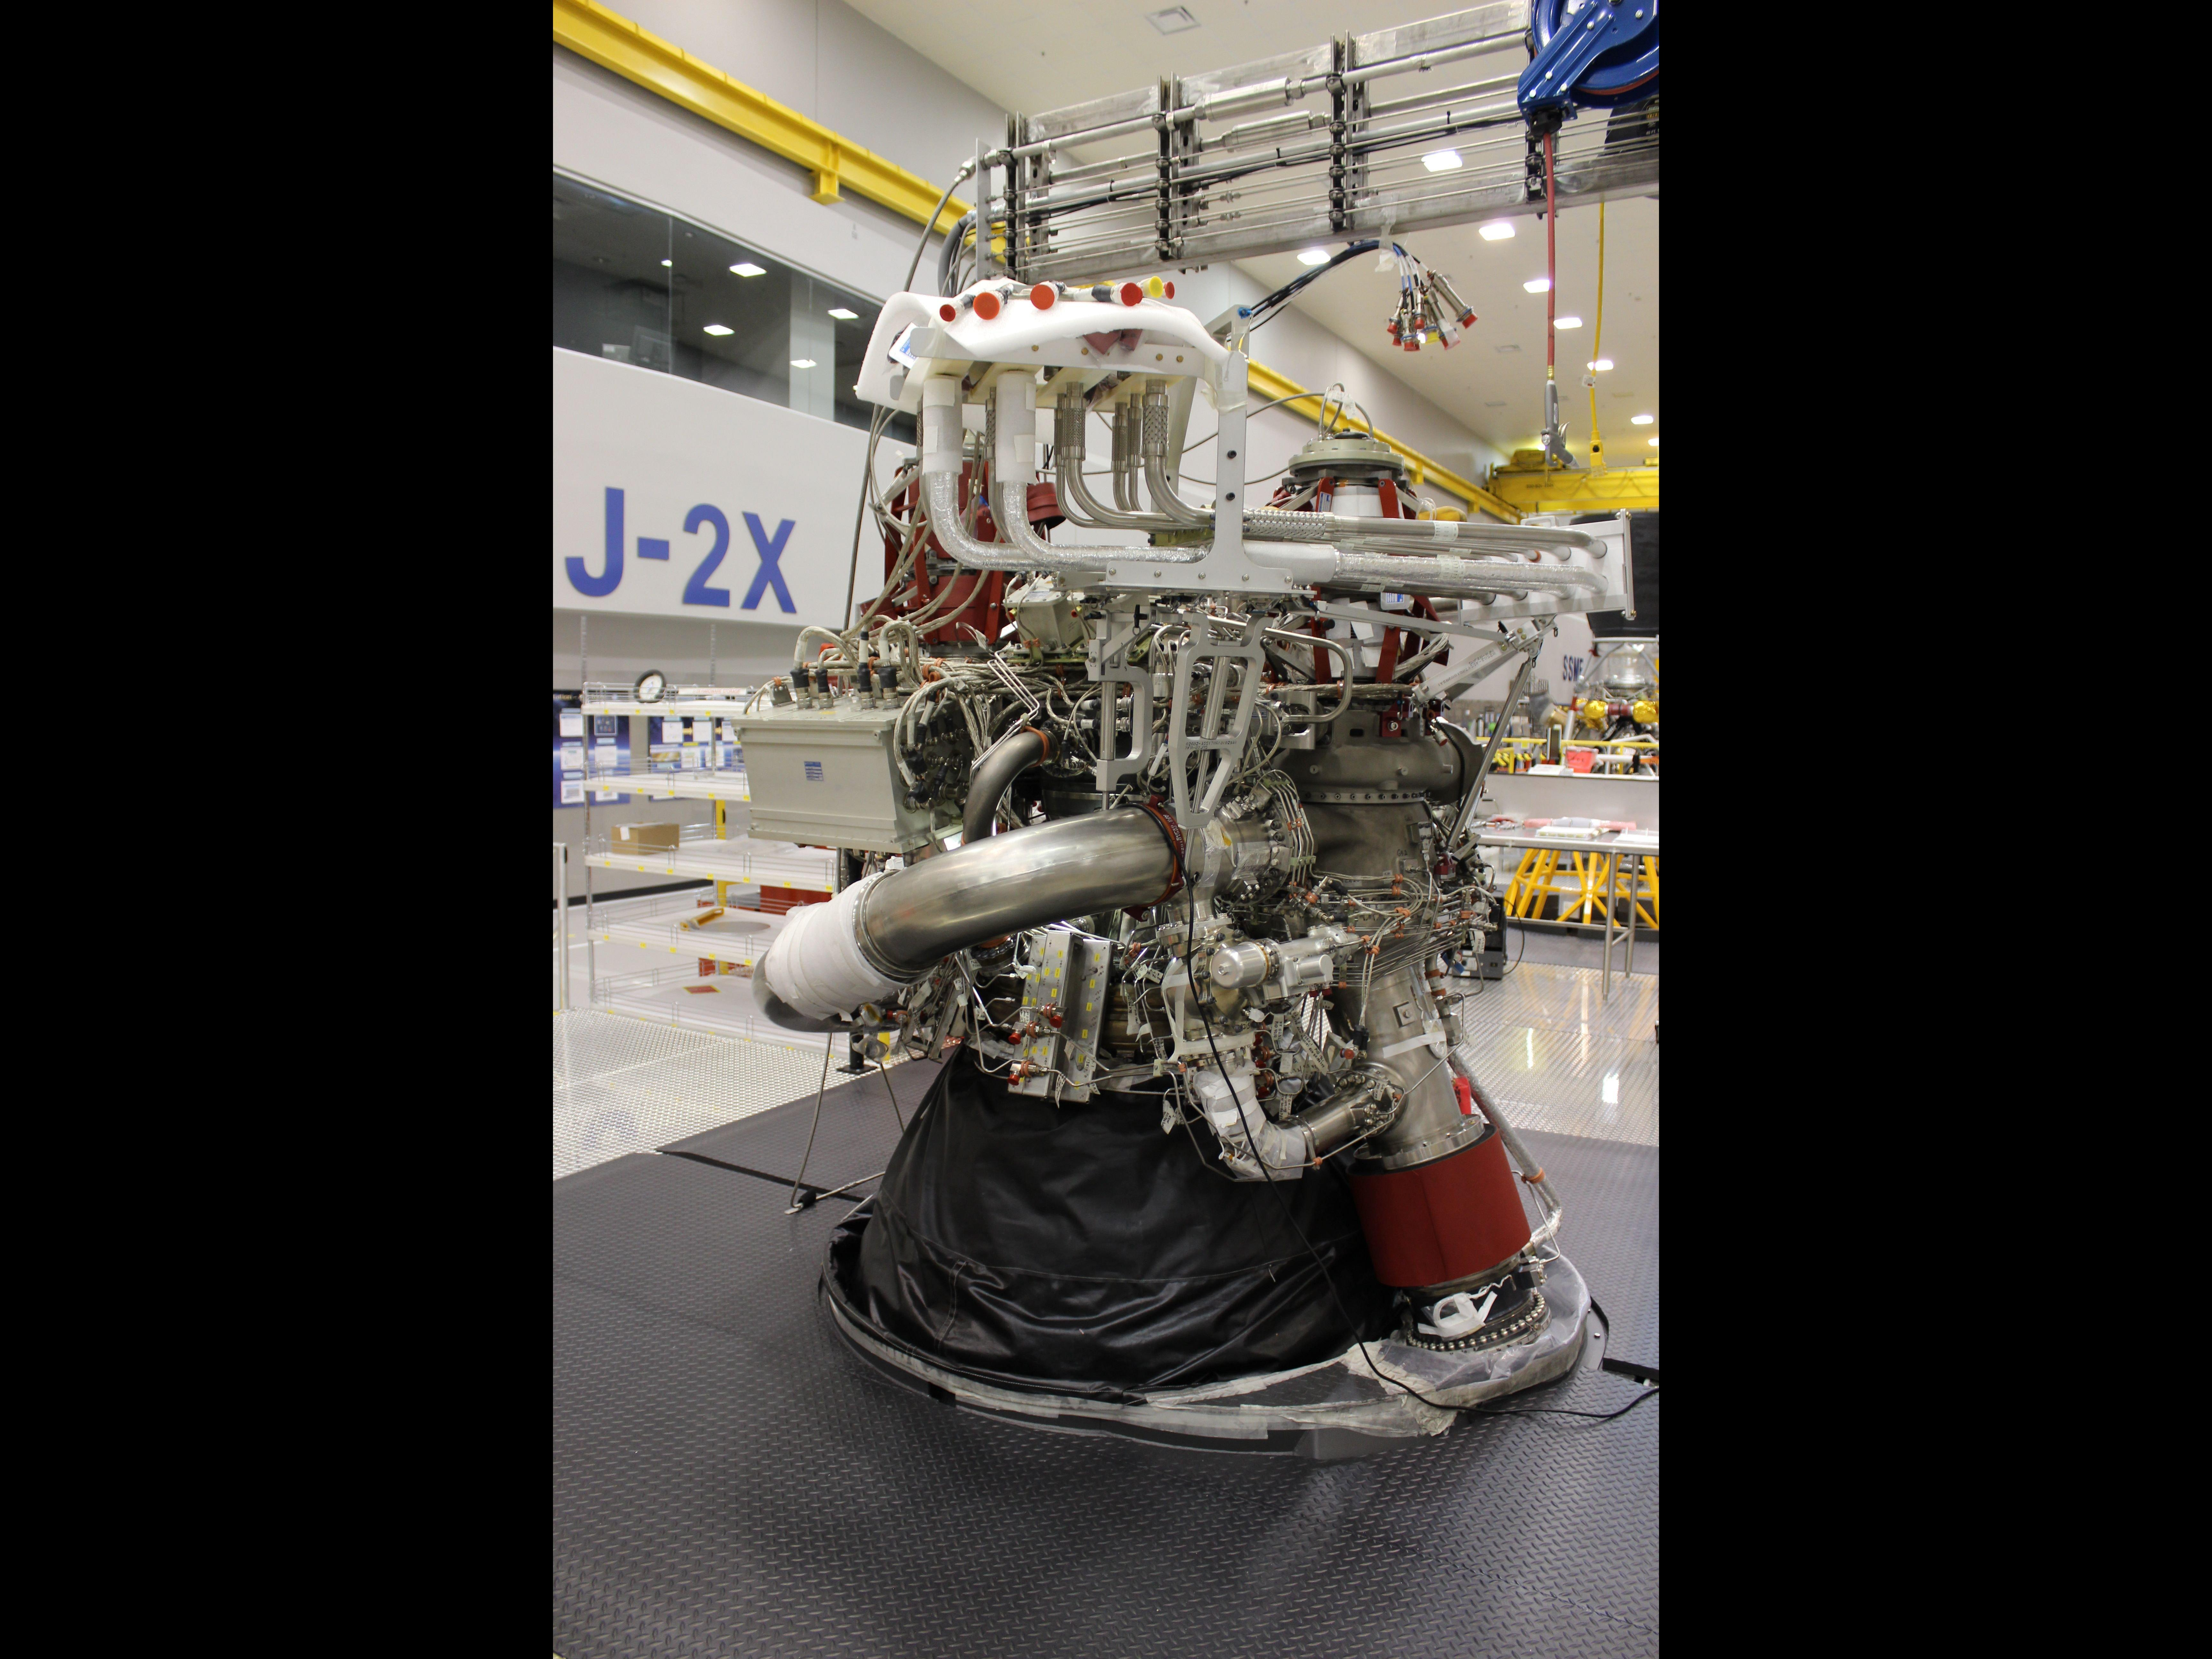 J-2X Rocket Engine Nears Completion | NASA